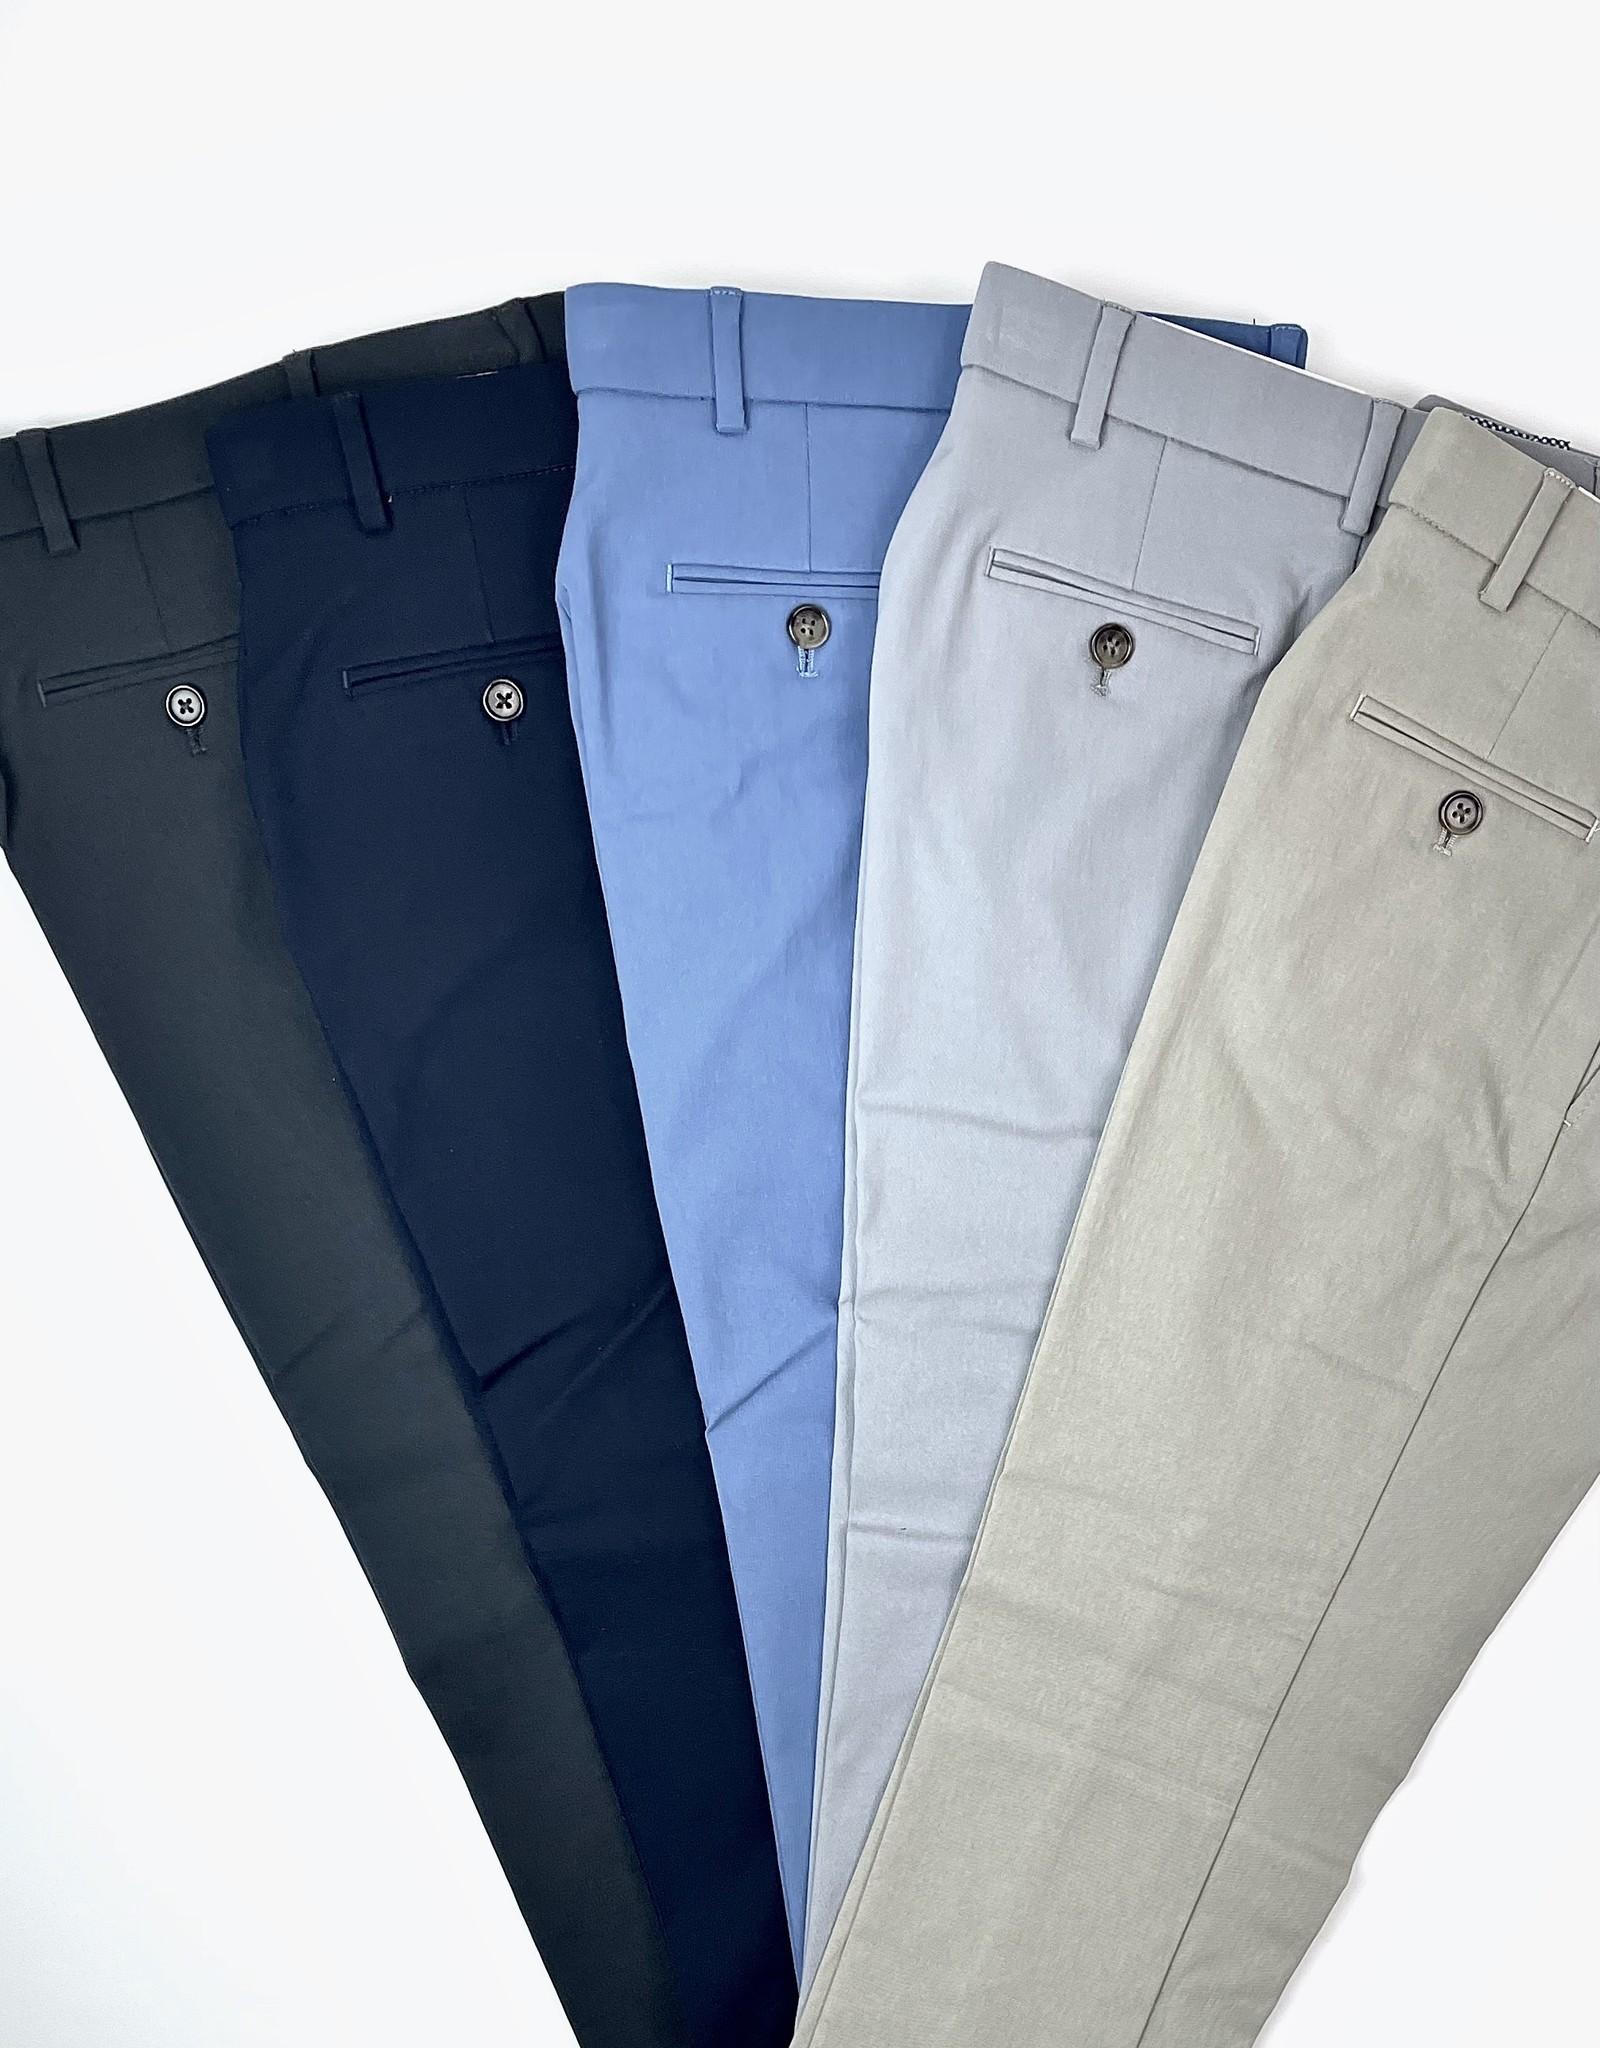 Trouser 4-way stretch Lauren